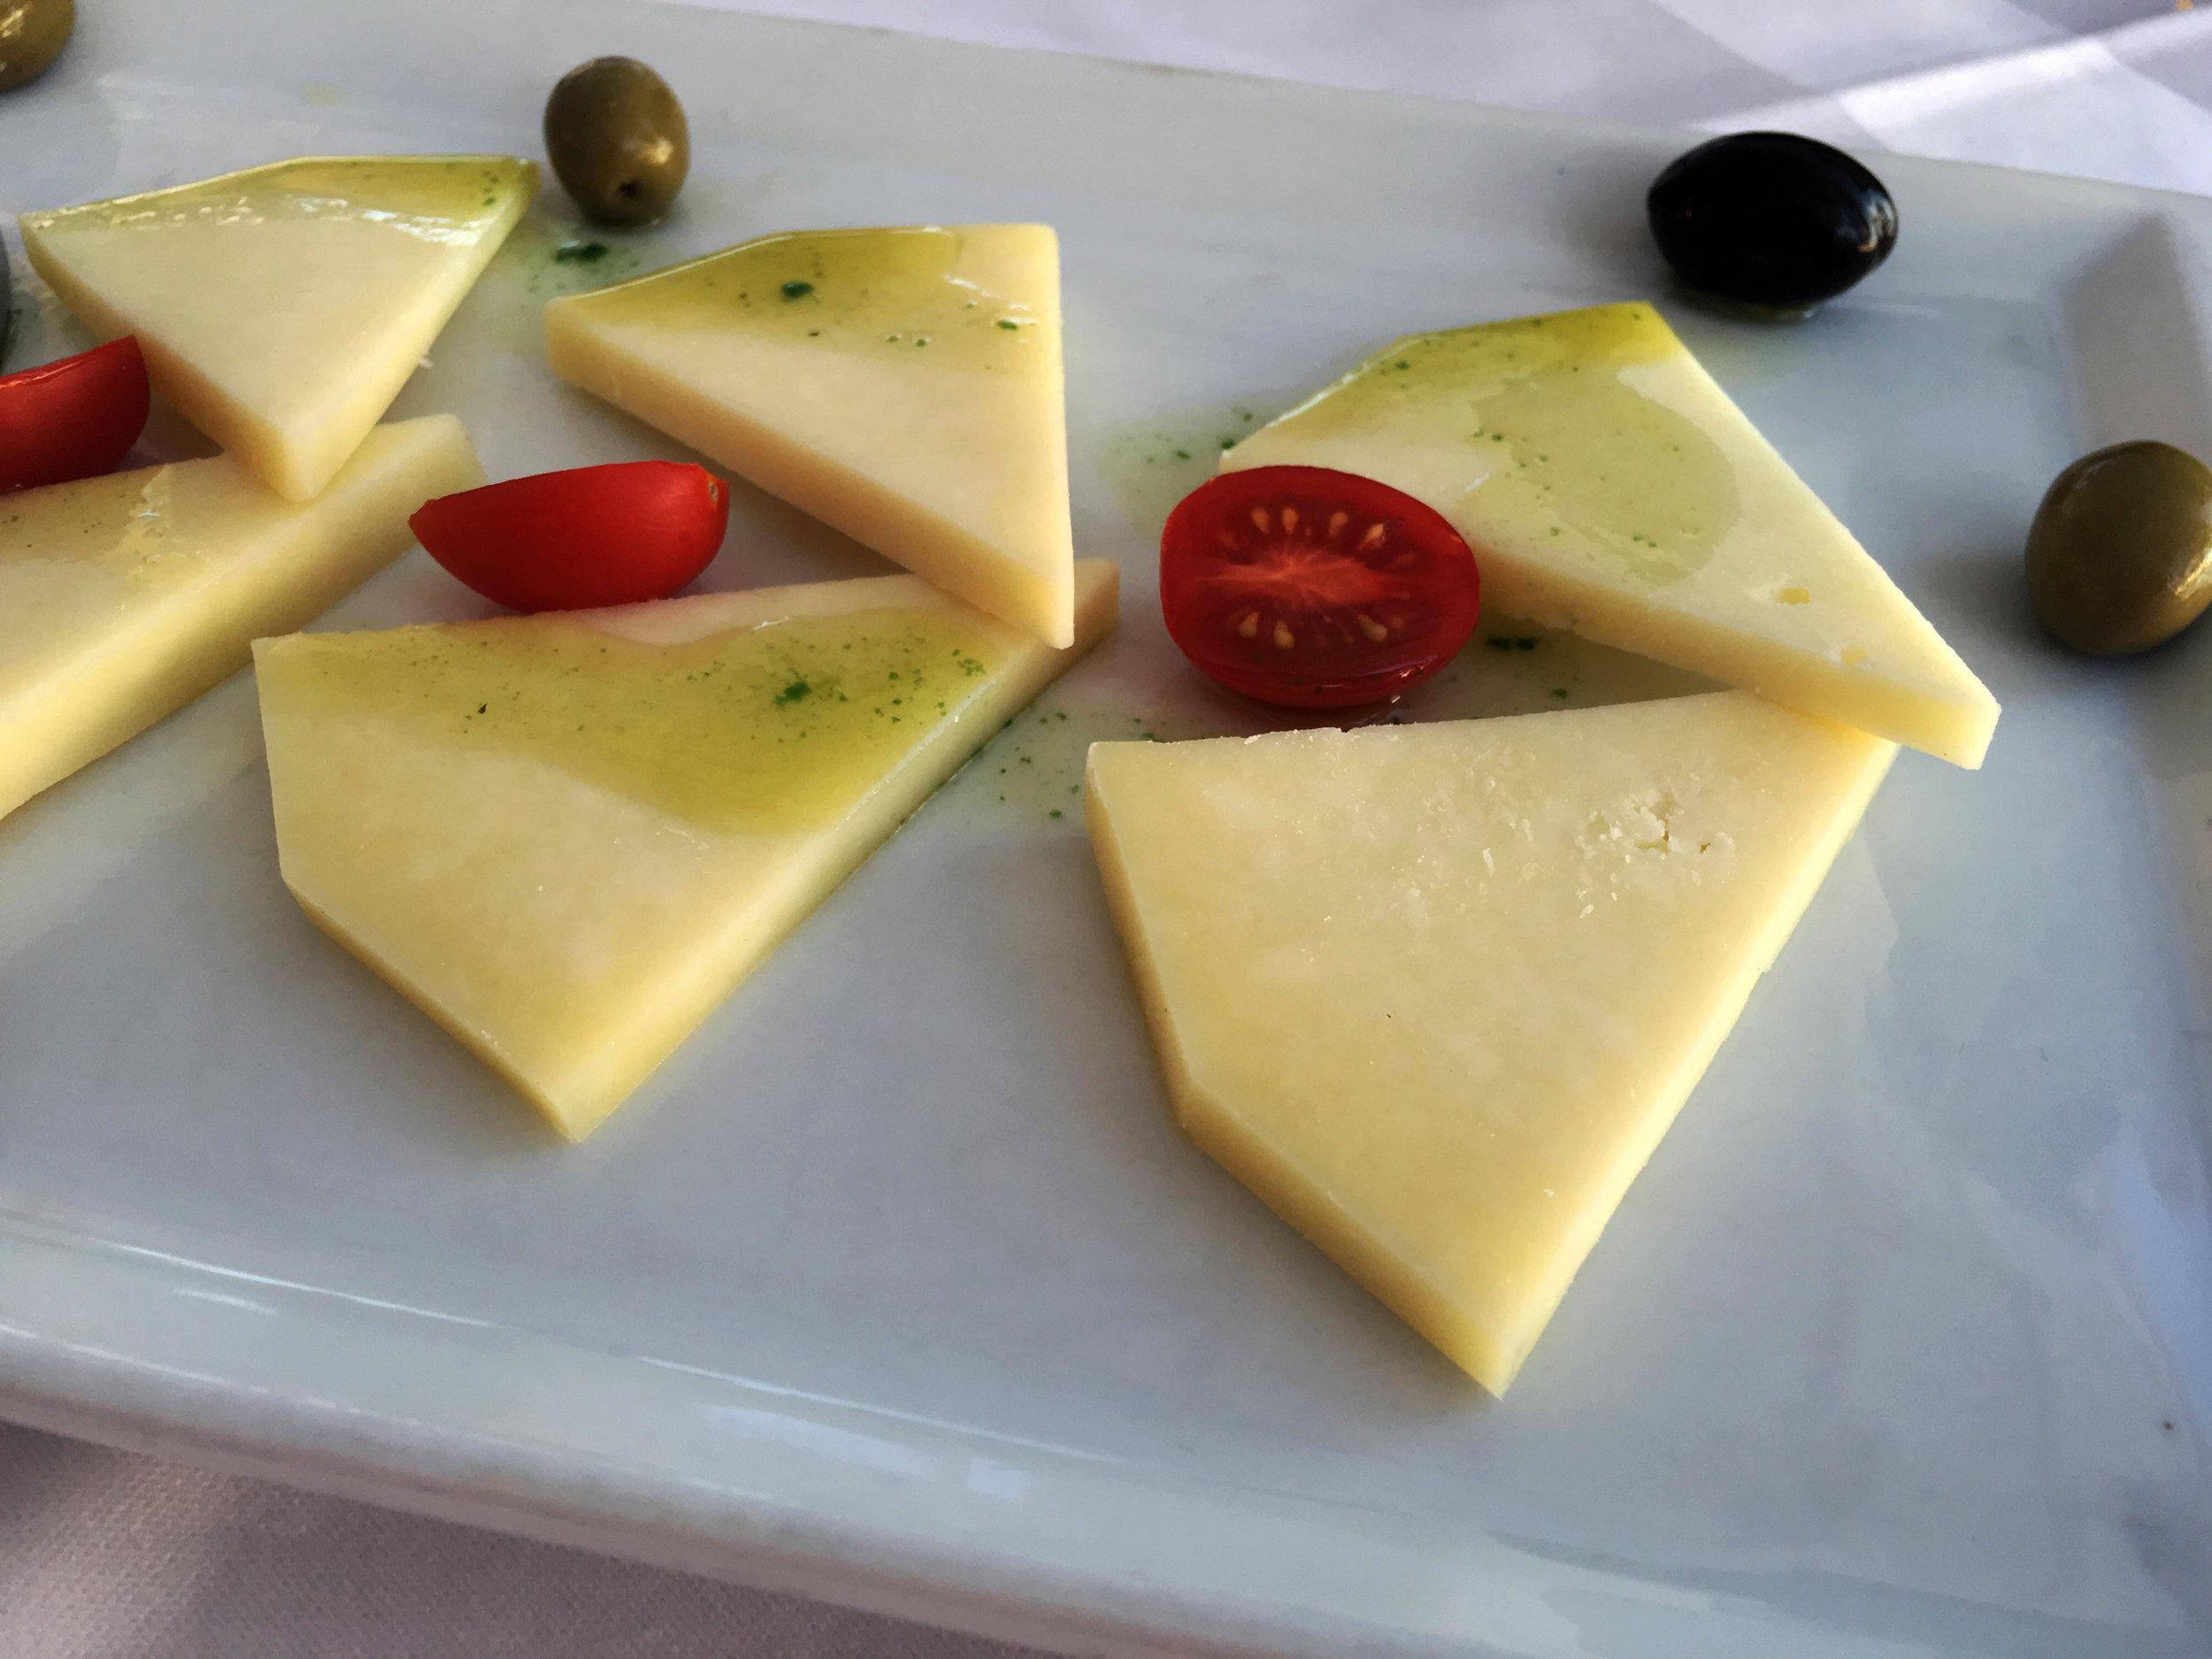 Appetizer from Gariful in Hvar